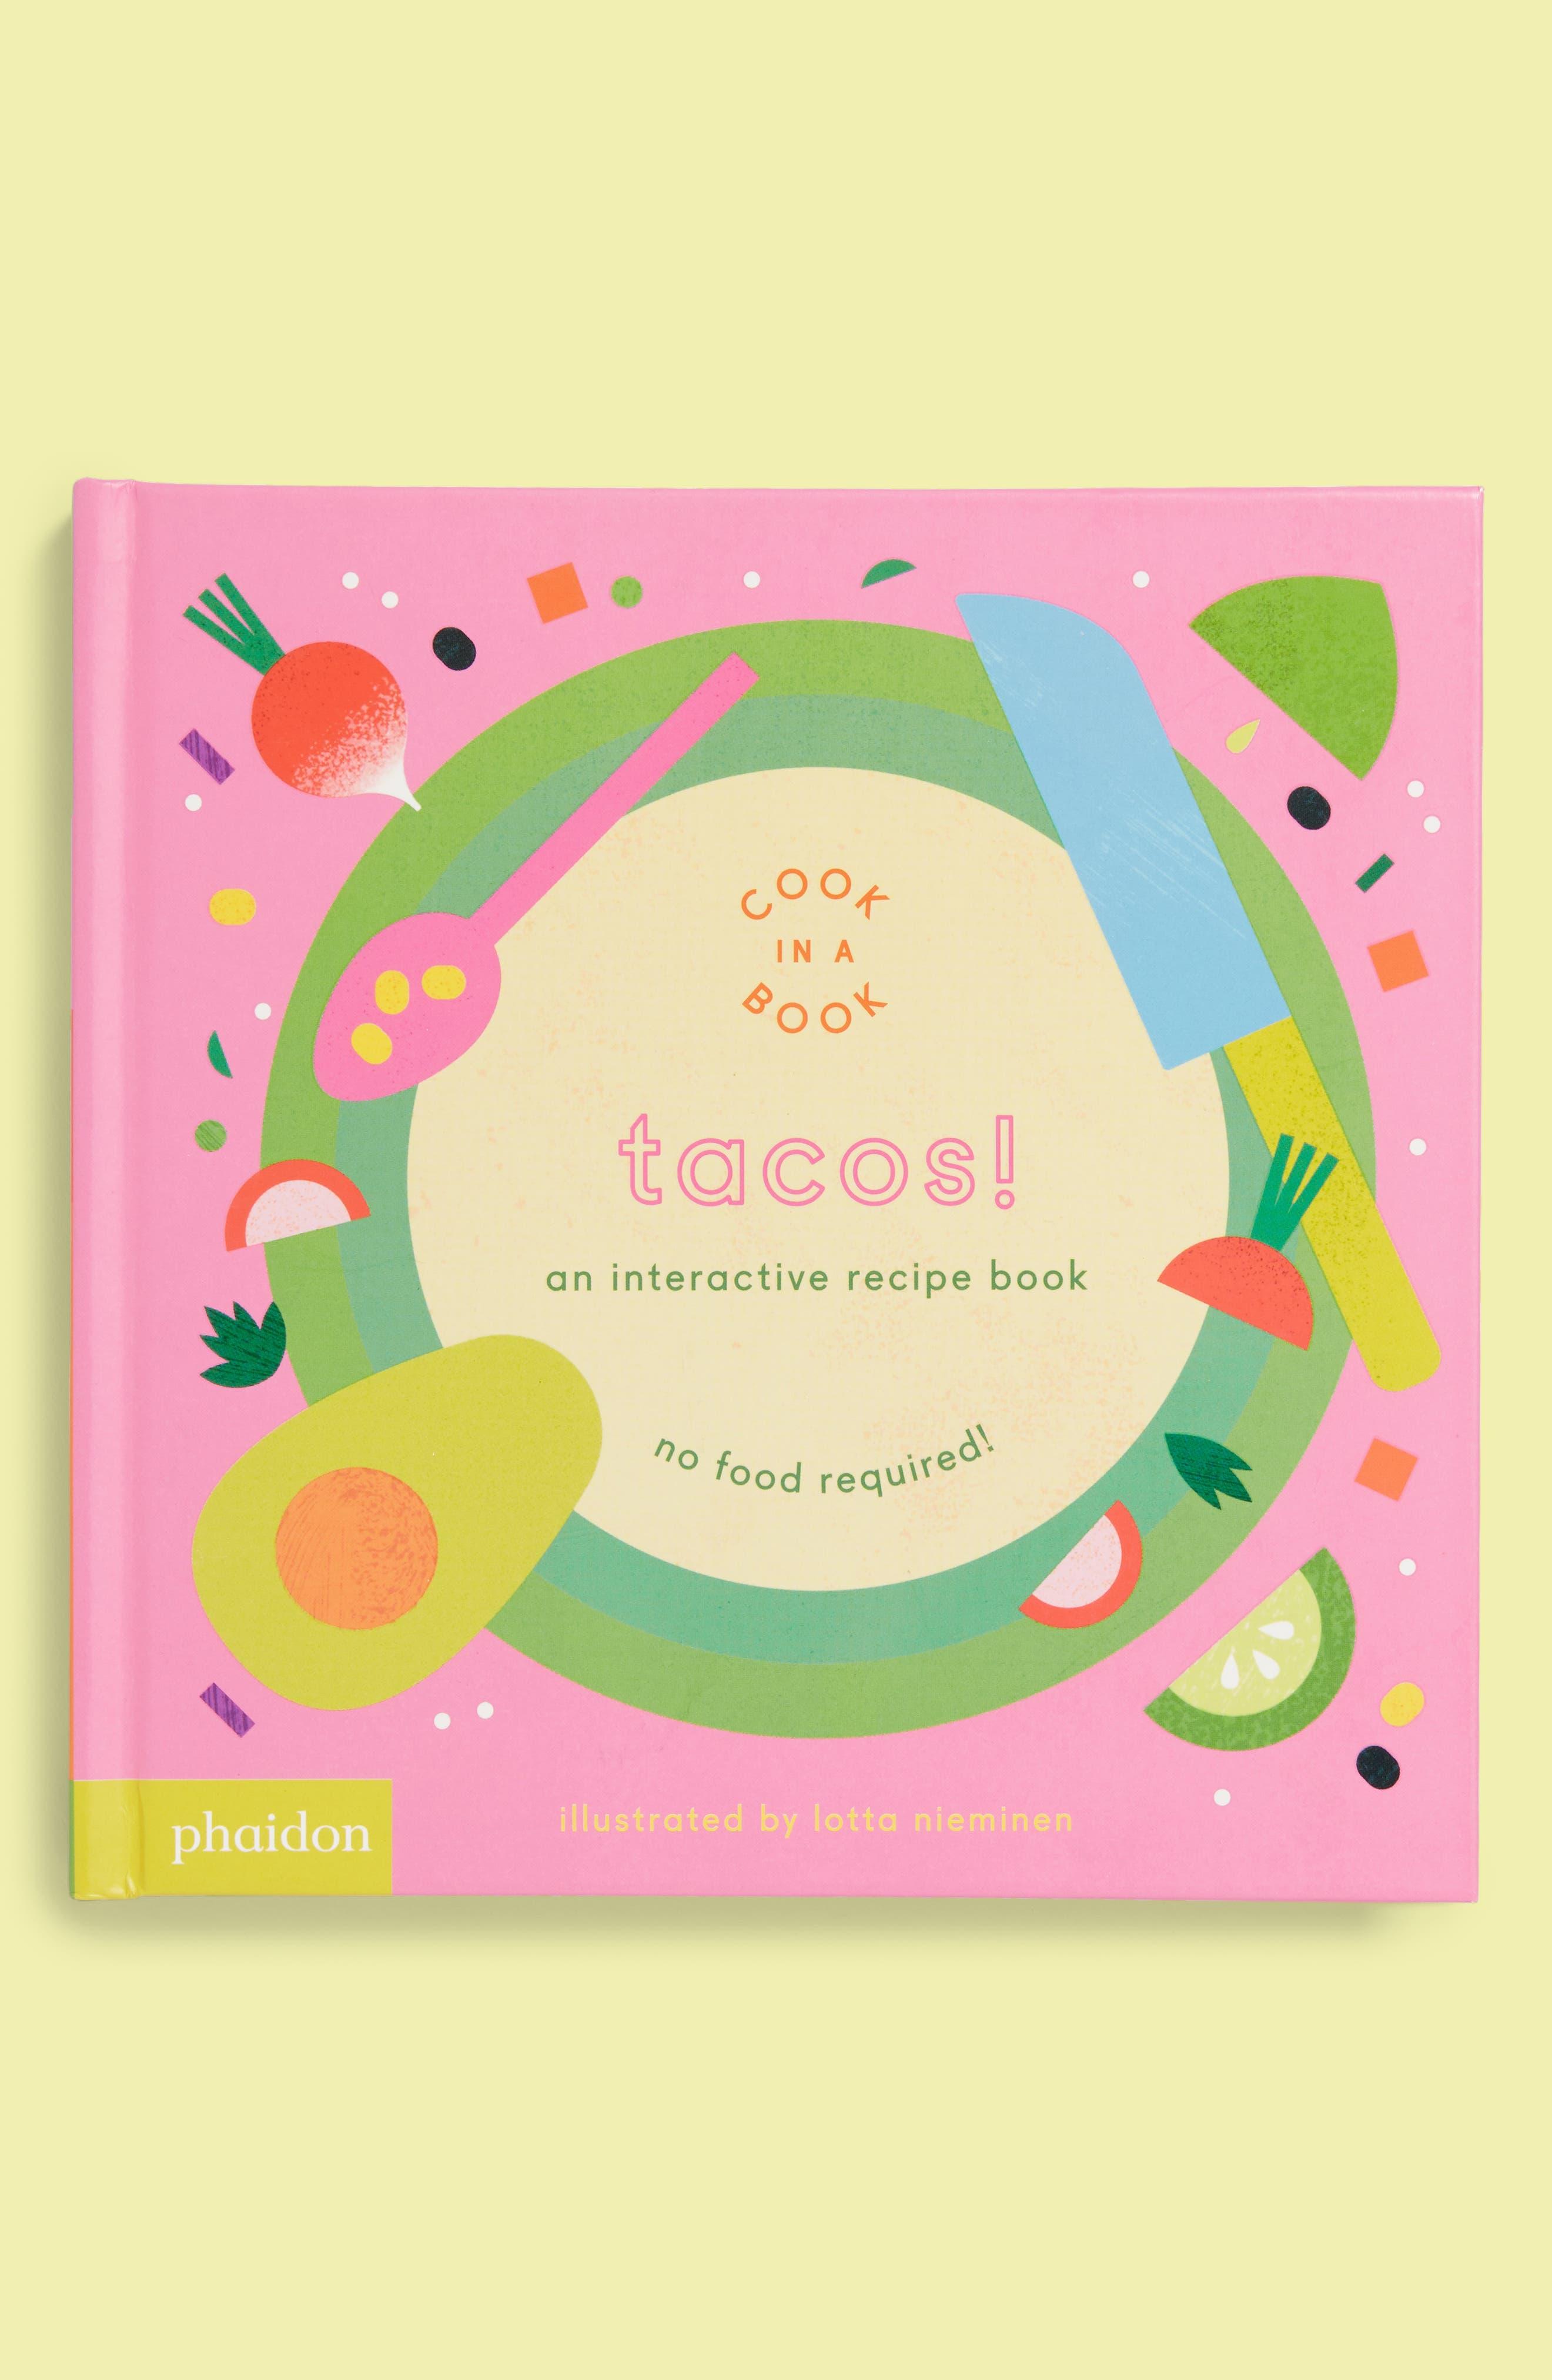 Cook In A Book - Tacos! Interactive Recipe Book